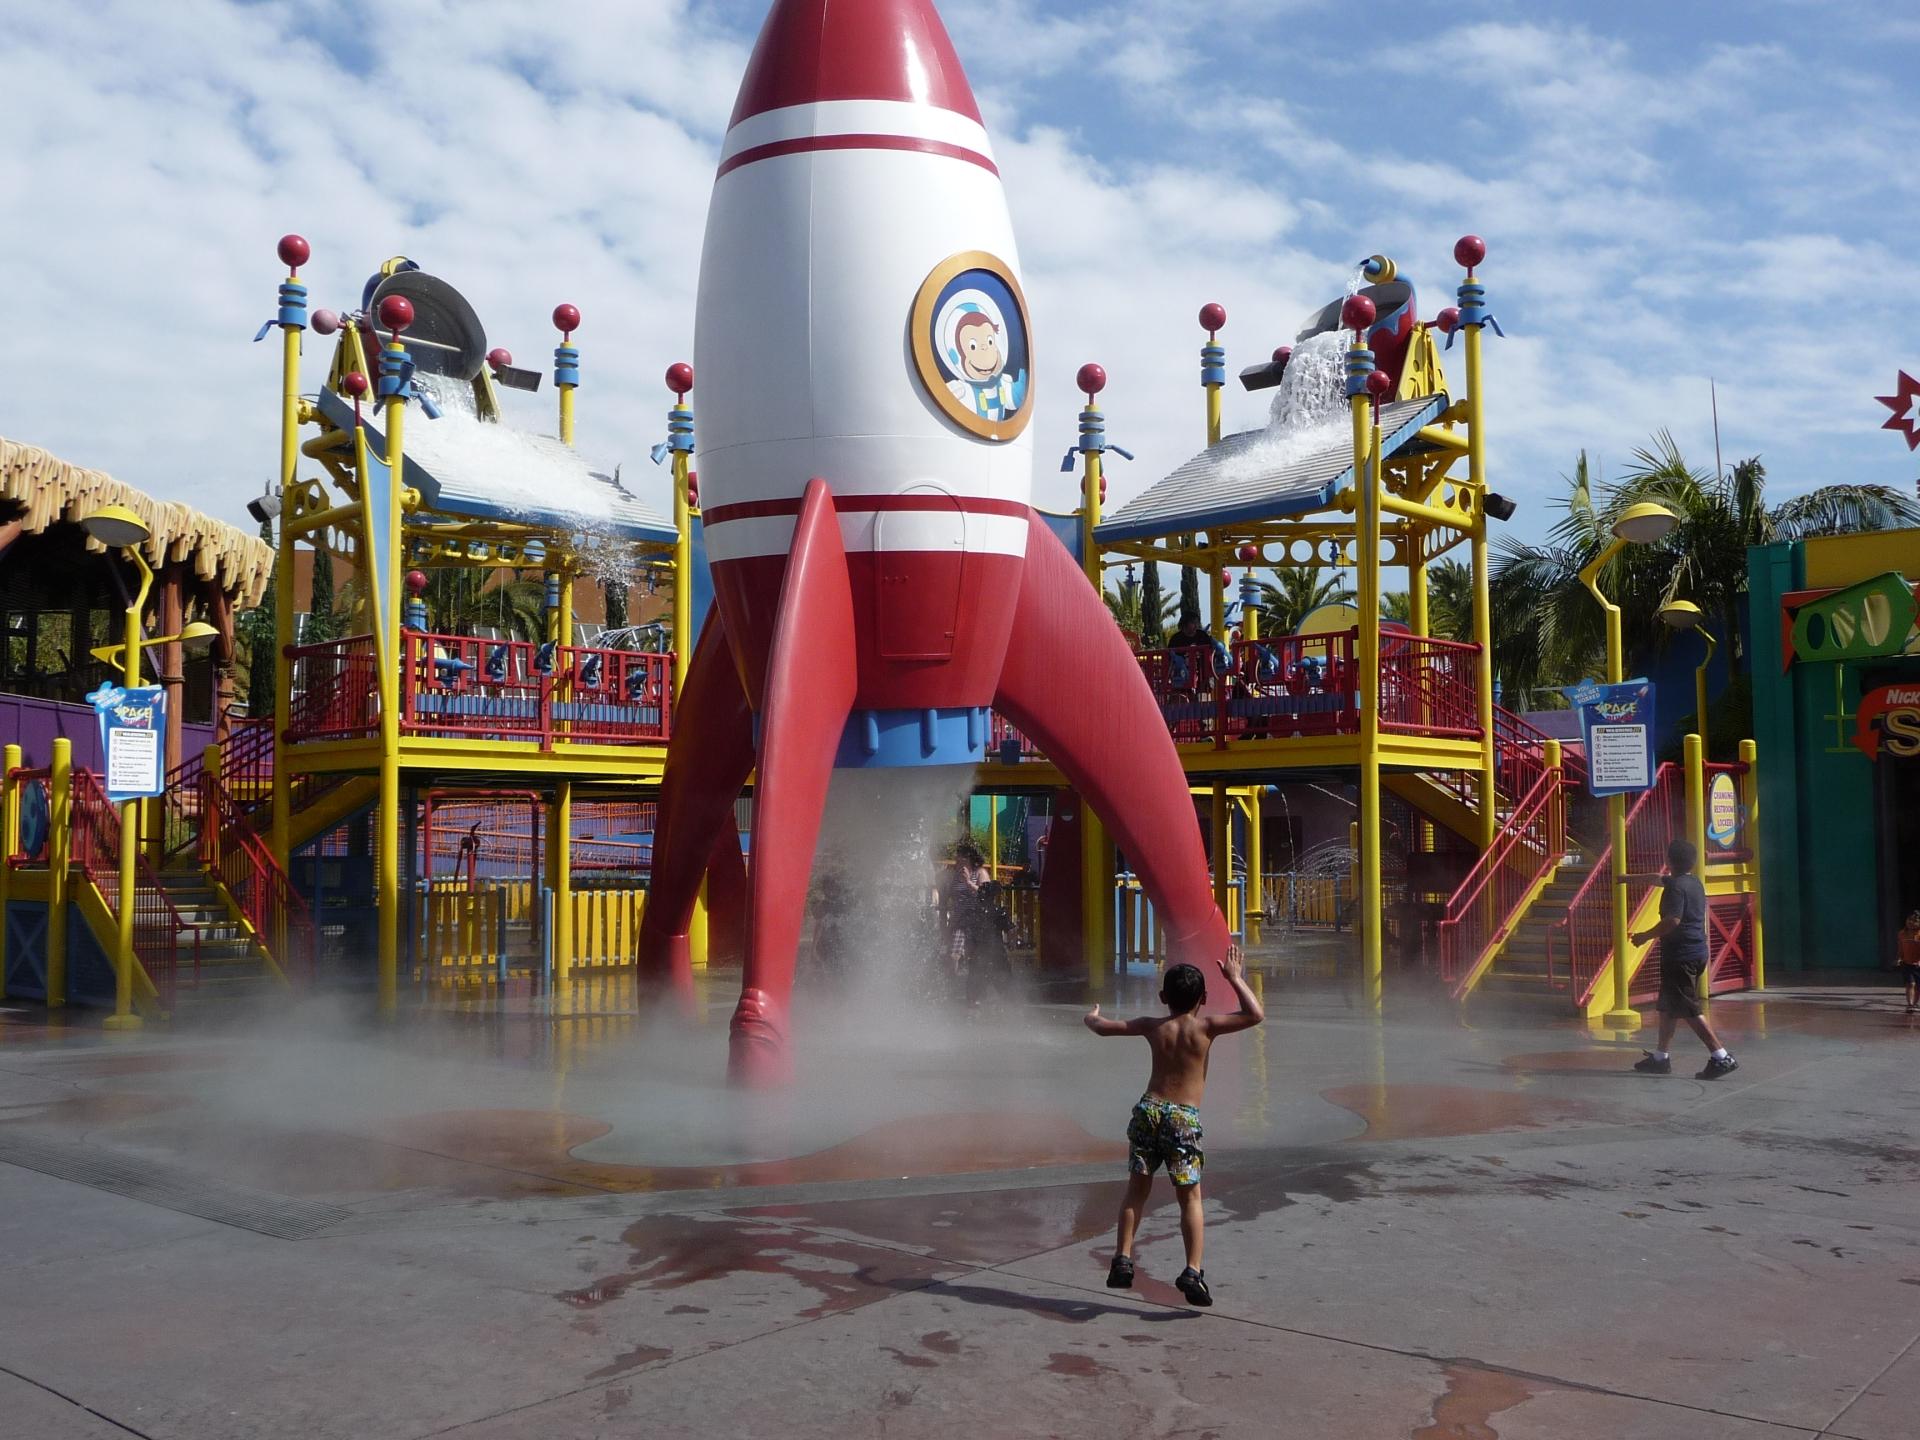 Curious George playground at Universal studios